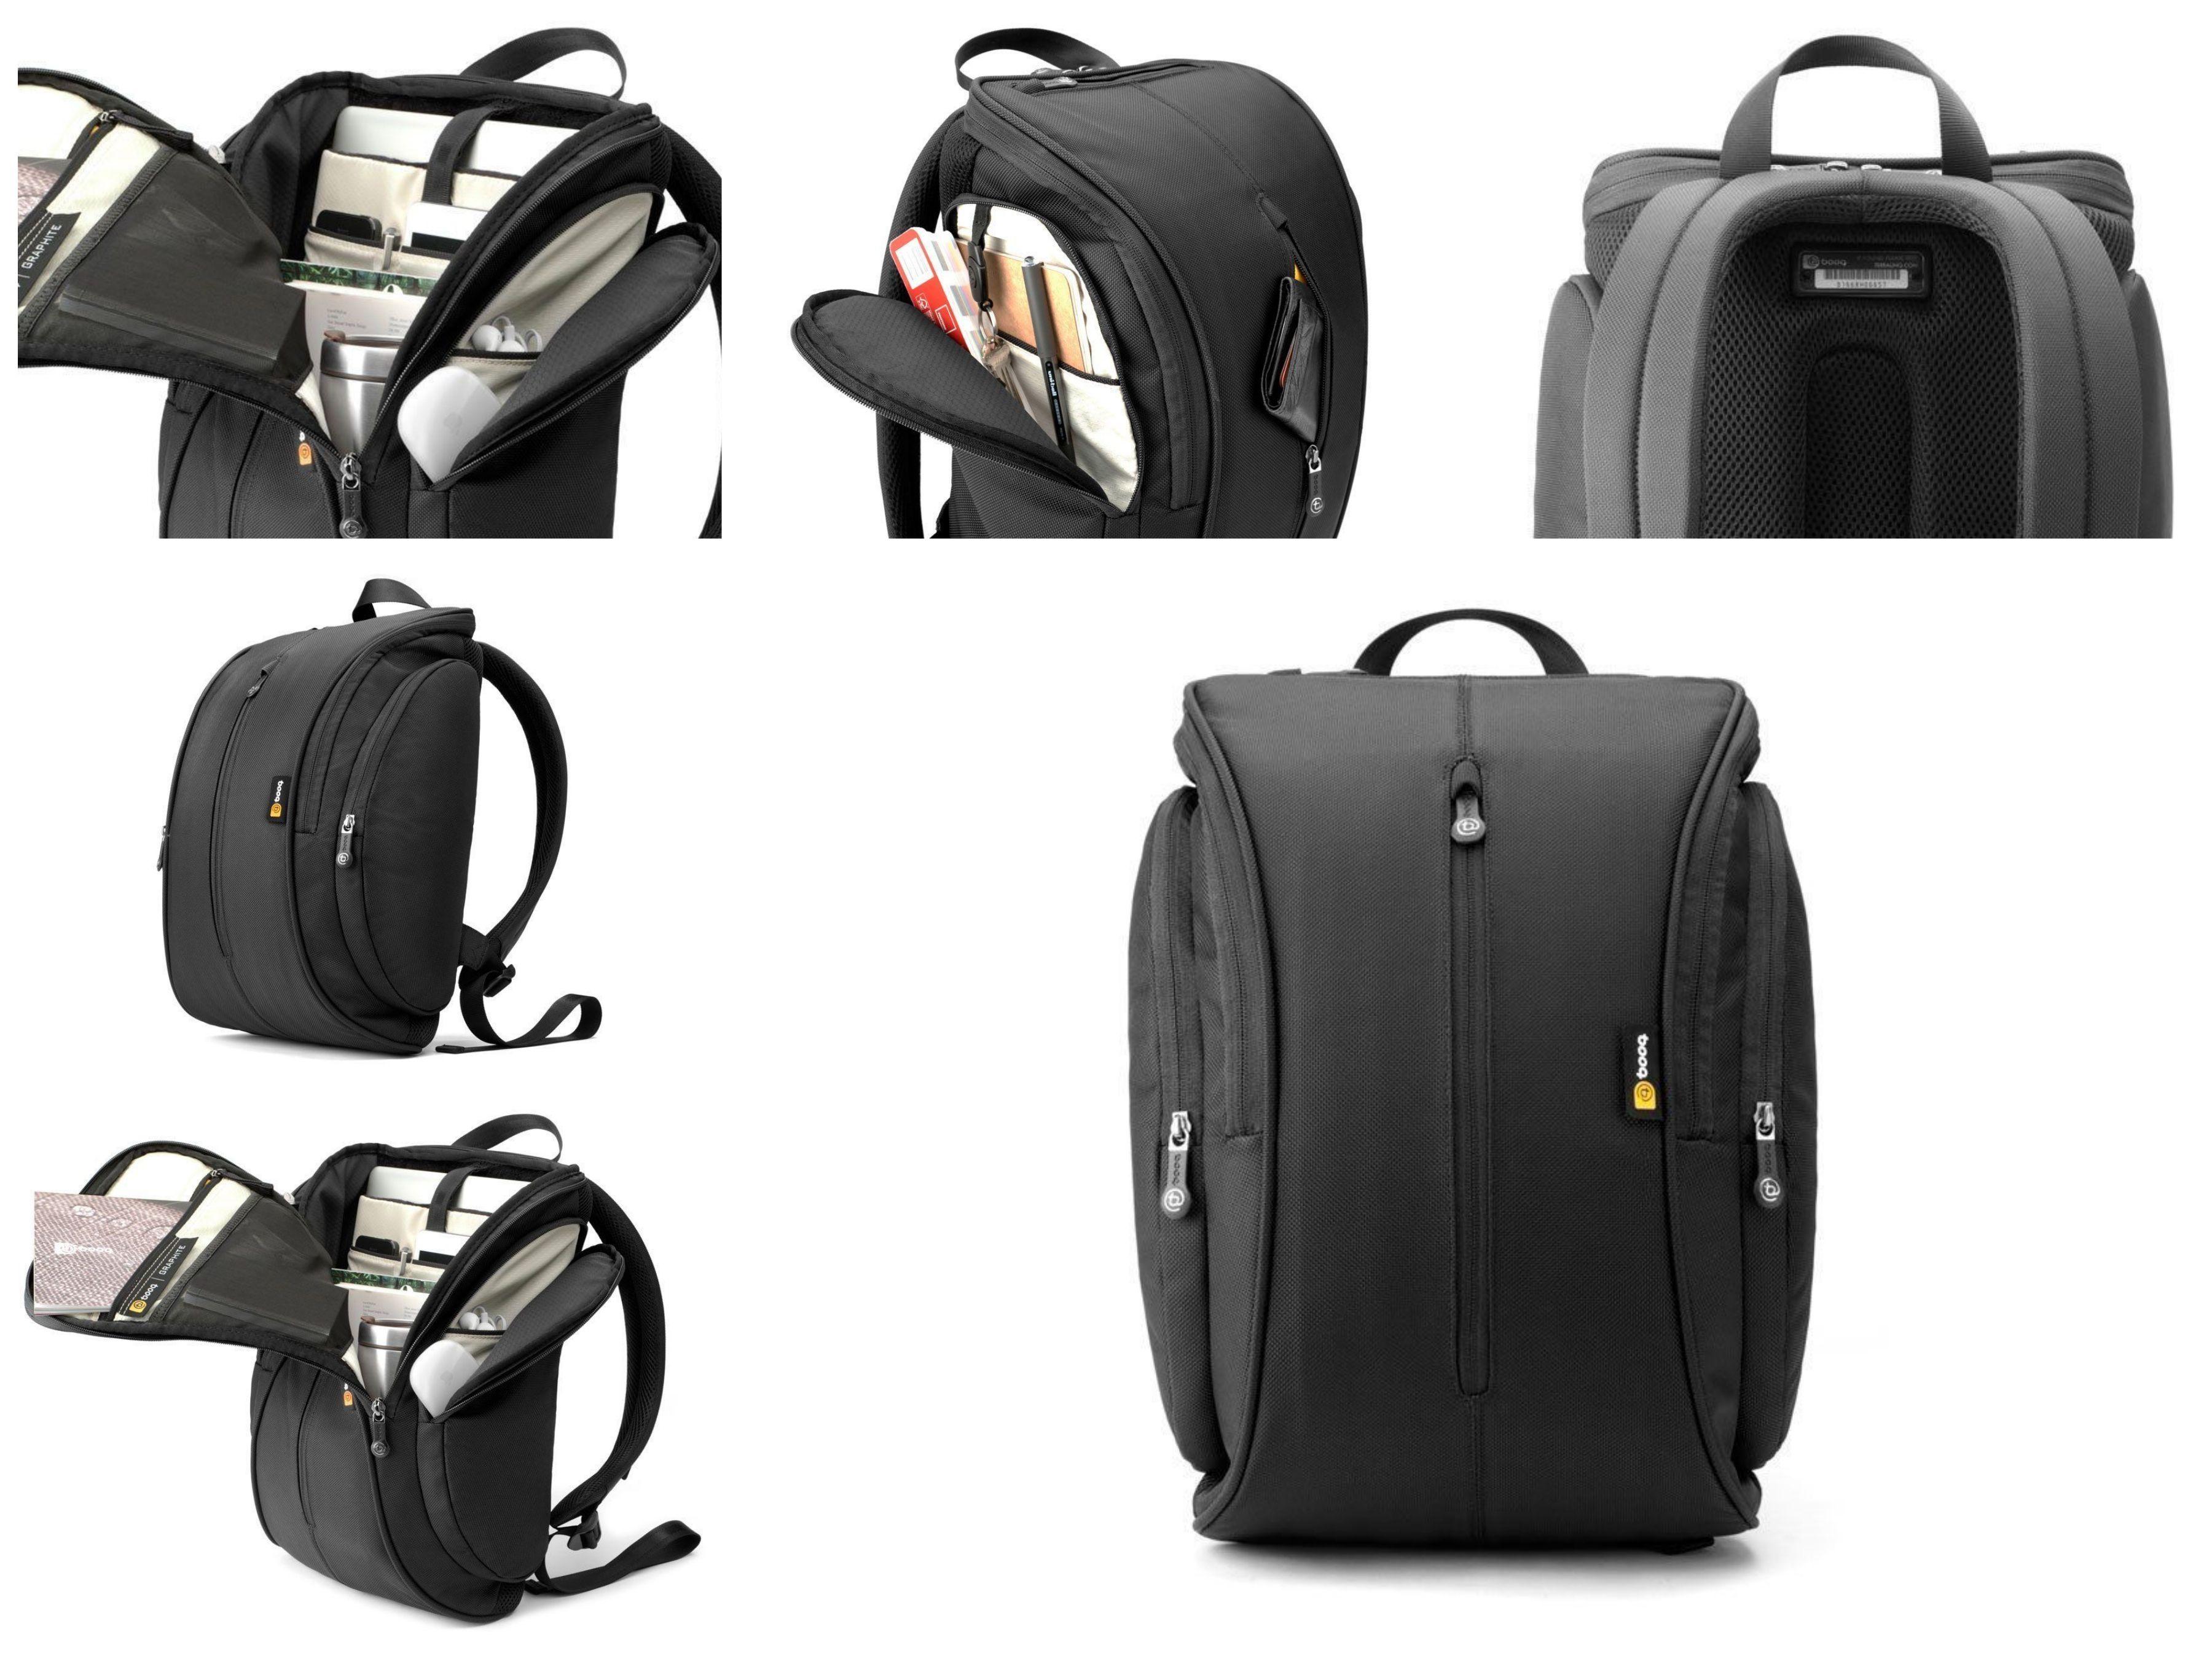 €140 Booq Boa Squeeze Backpack